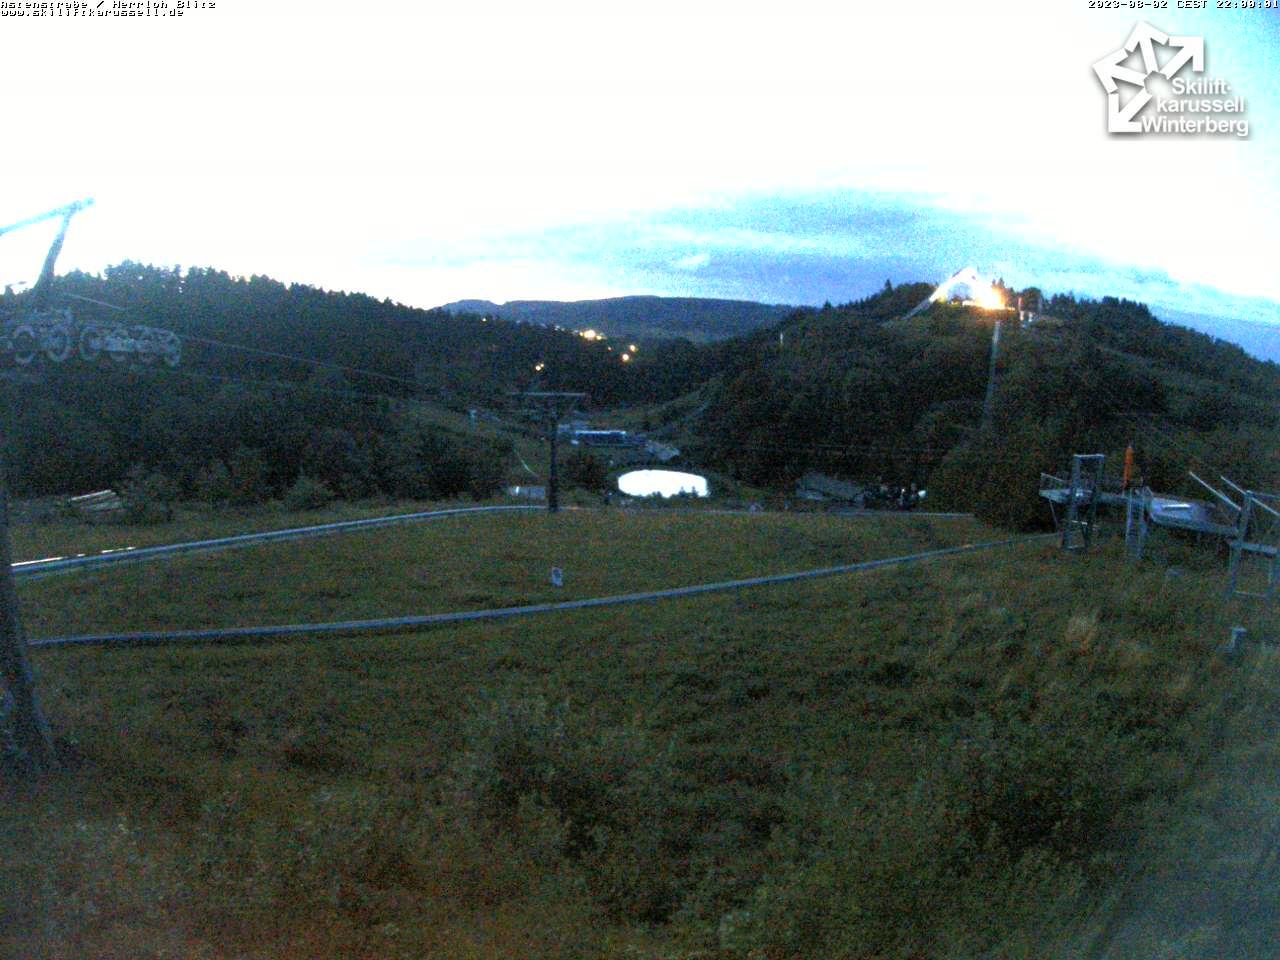 Skilift Astenstrasse, Winterberg